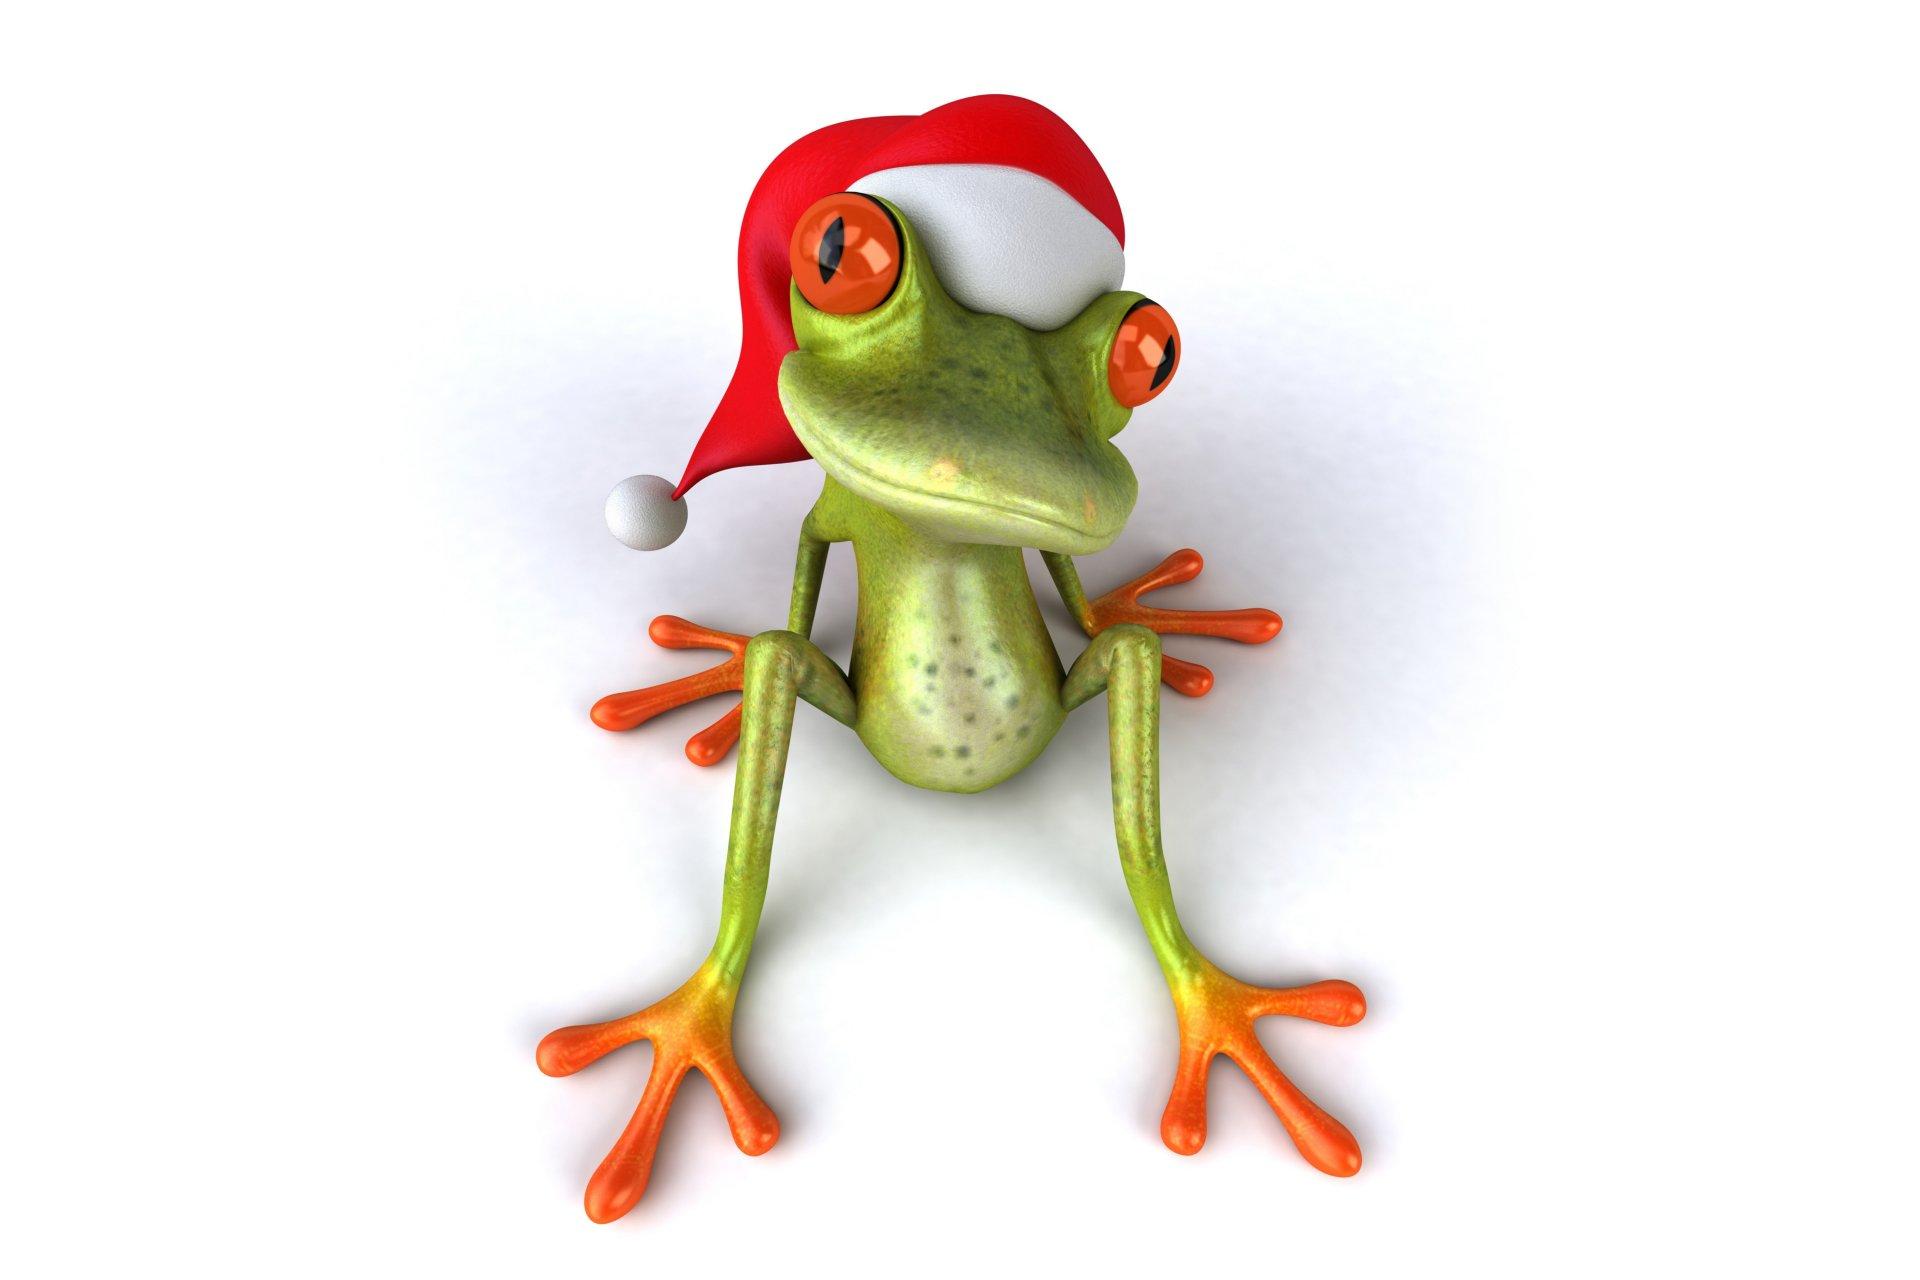 Позитивчика, рисунки лягушка прикольные